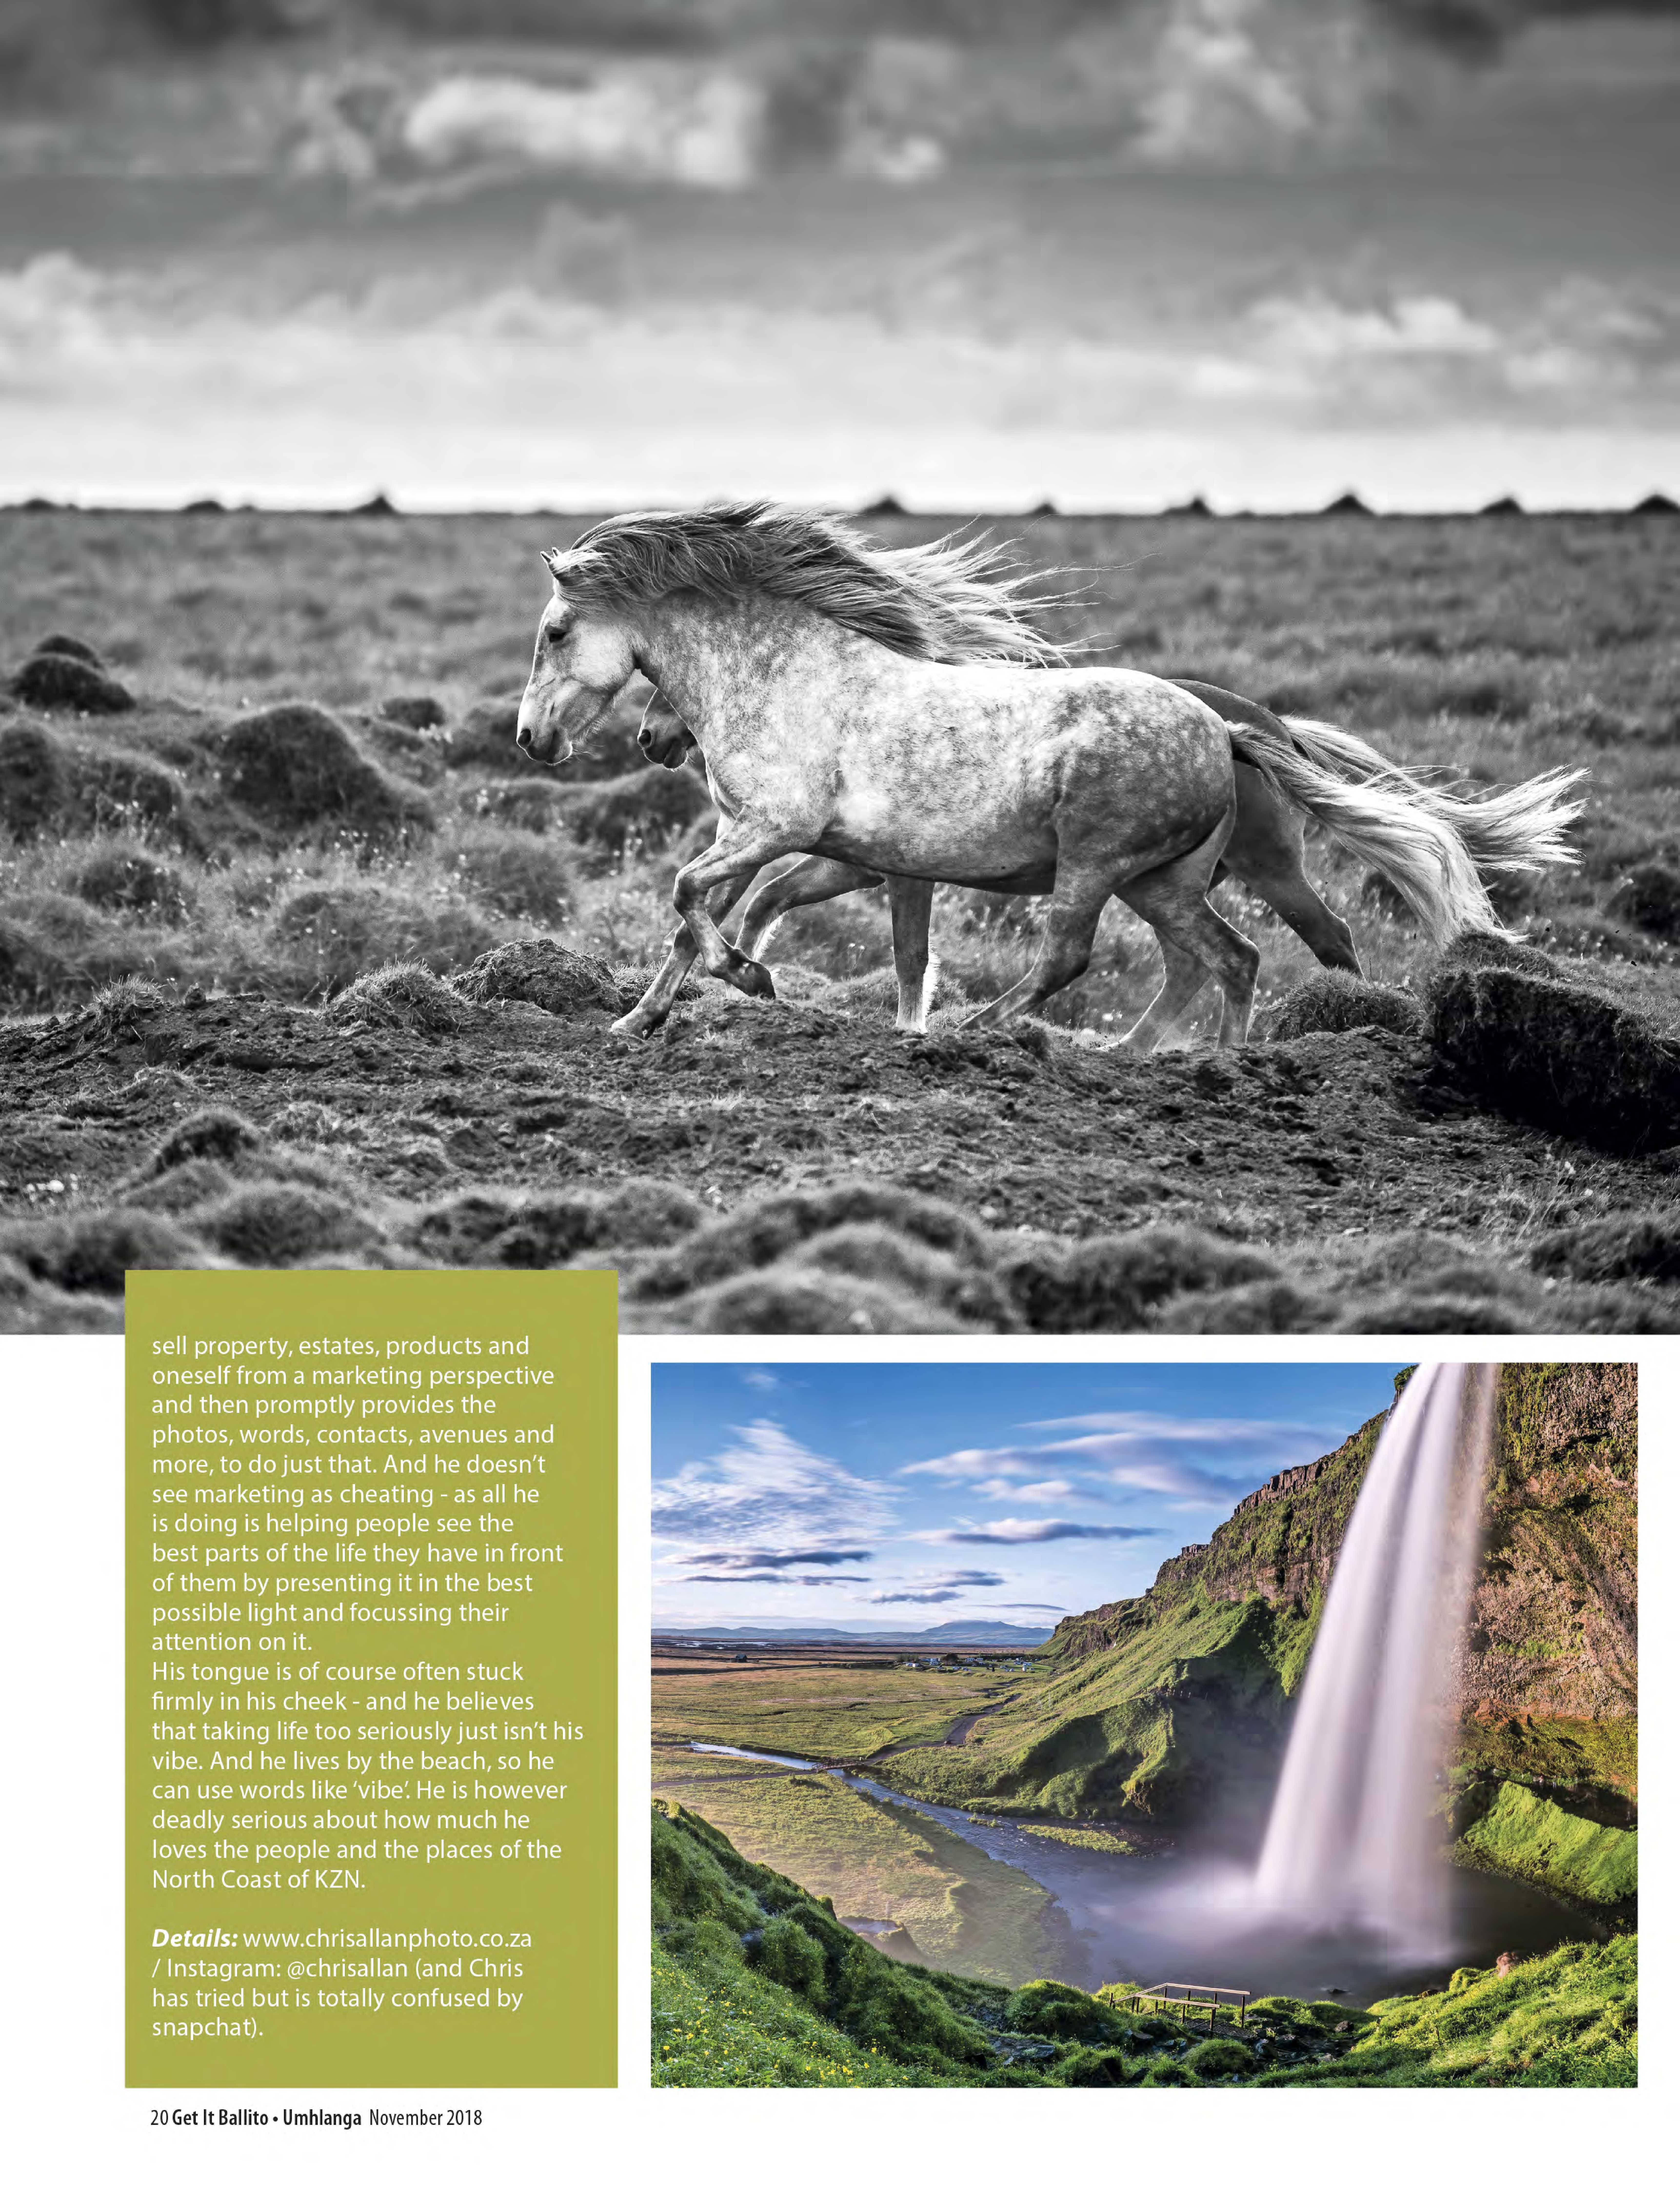 get-magazine-ballitoumhlanga-november-2018-epapers-page-22